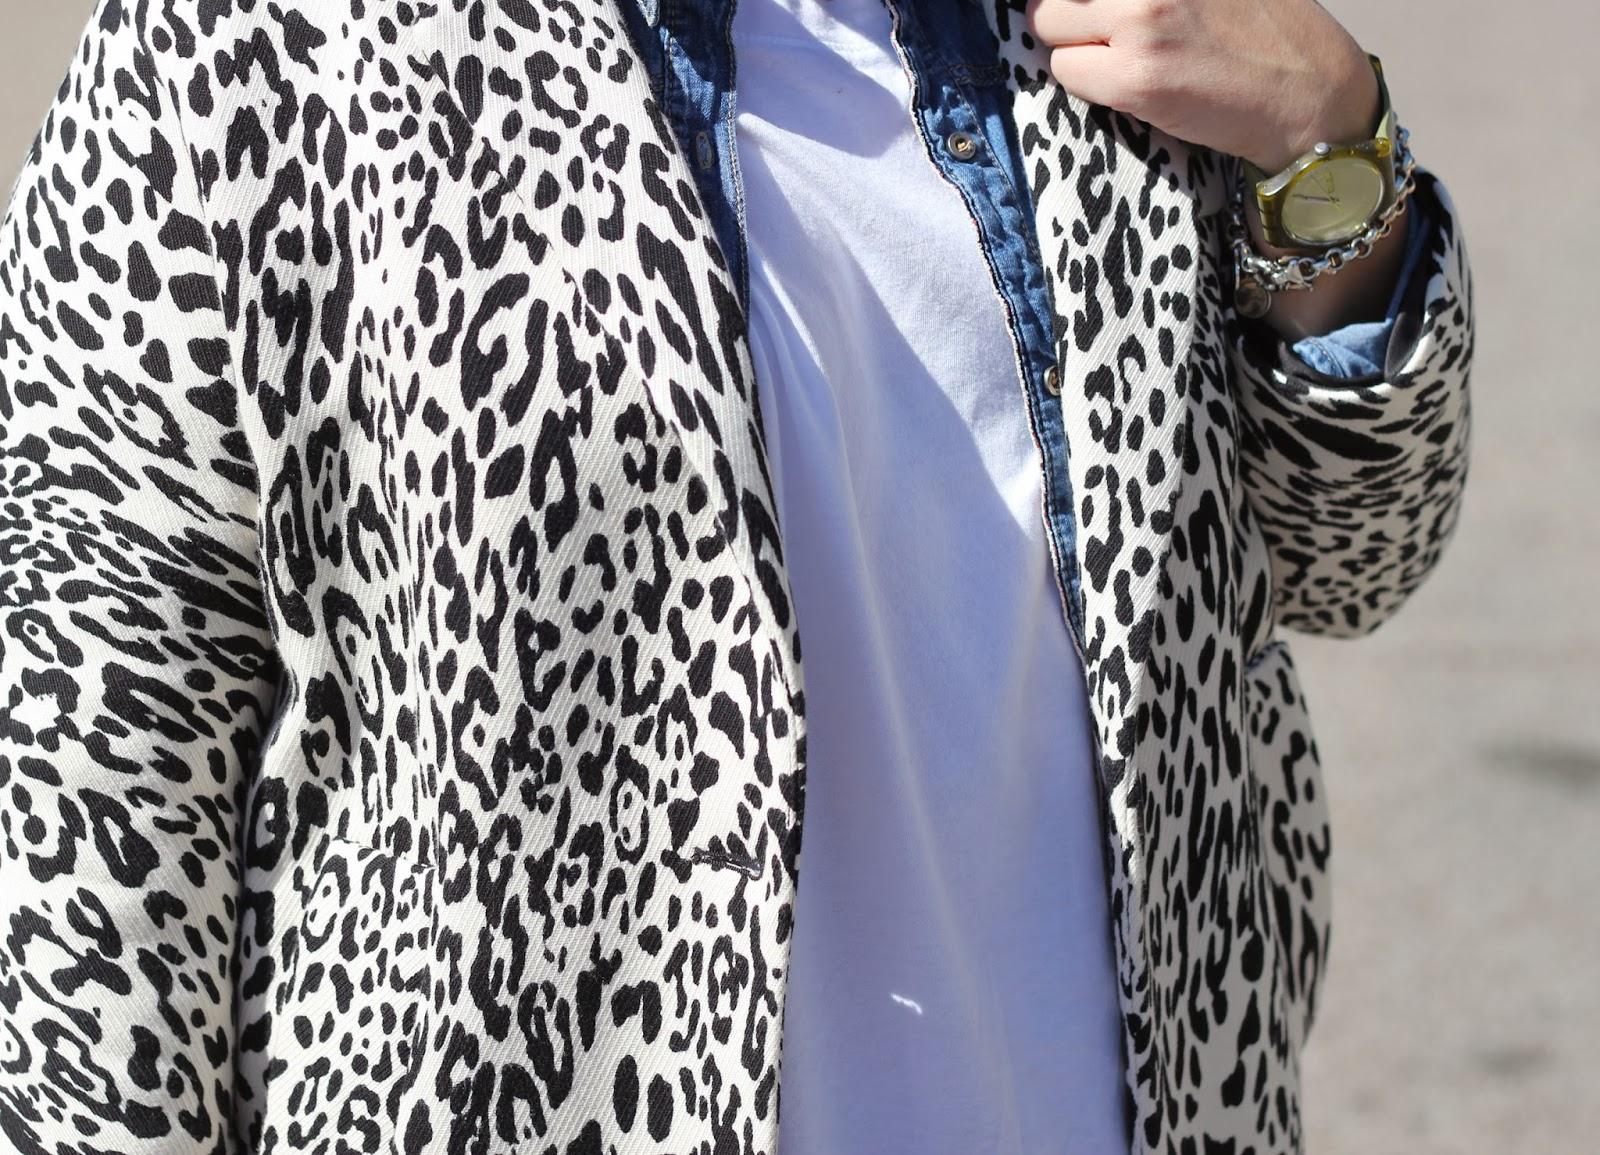 photo-b&wleopard_coat-denim-yellog_bag